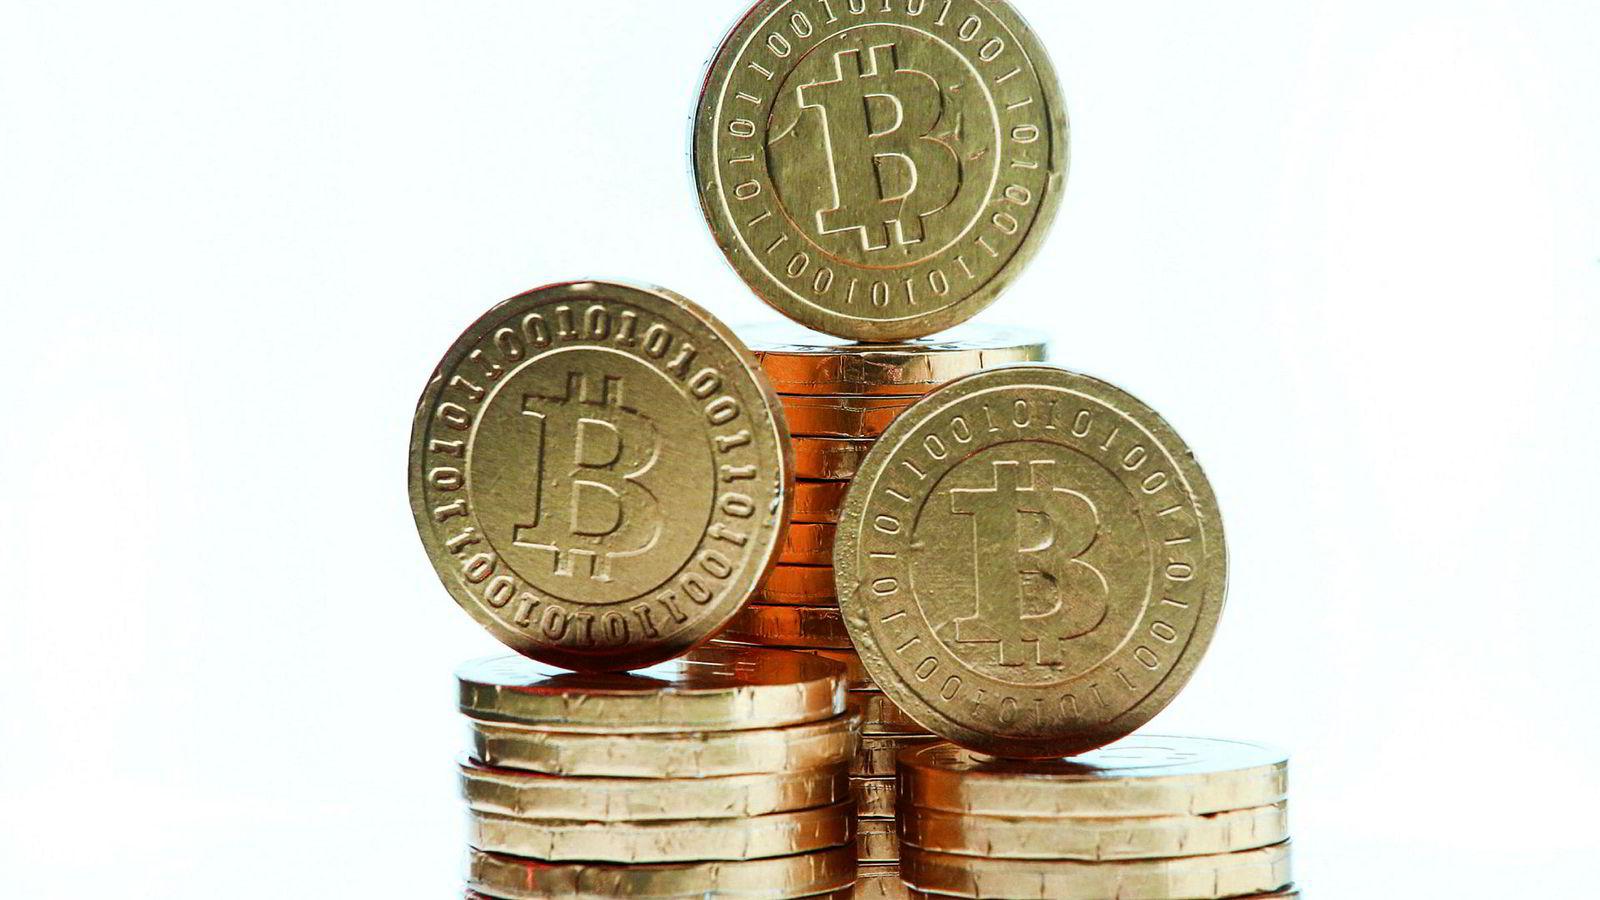 Bitcoin kursen stuper i desember.